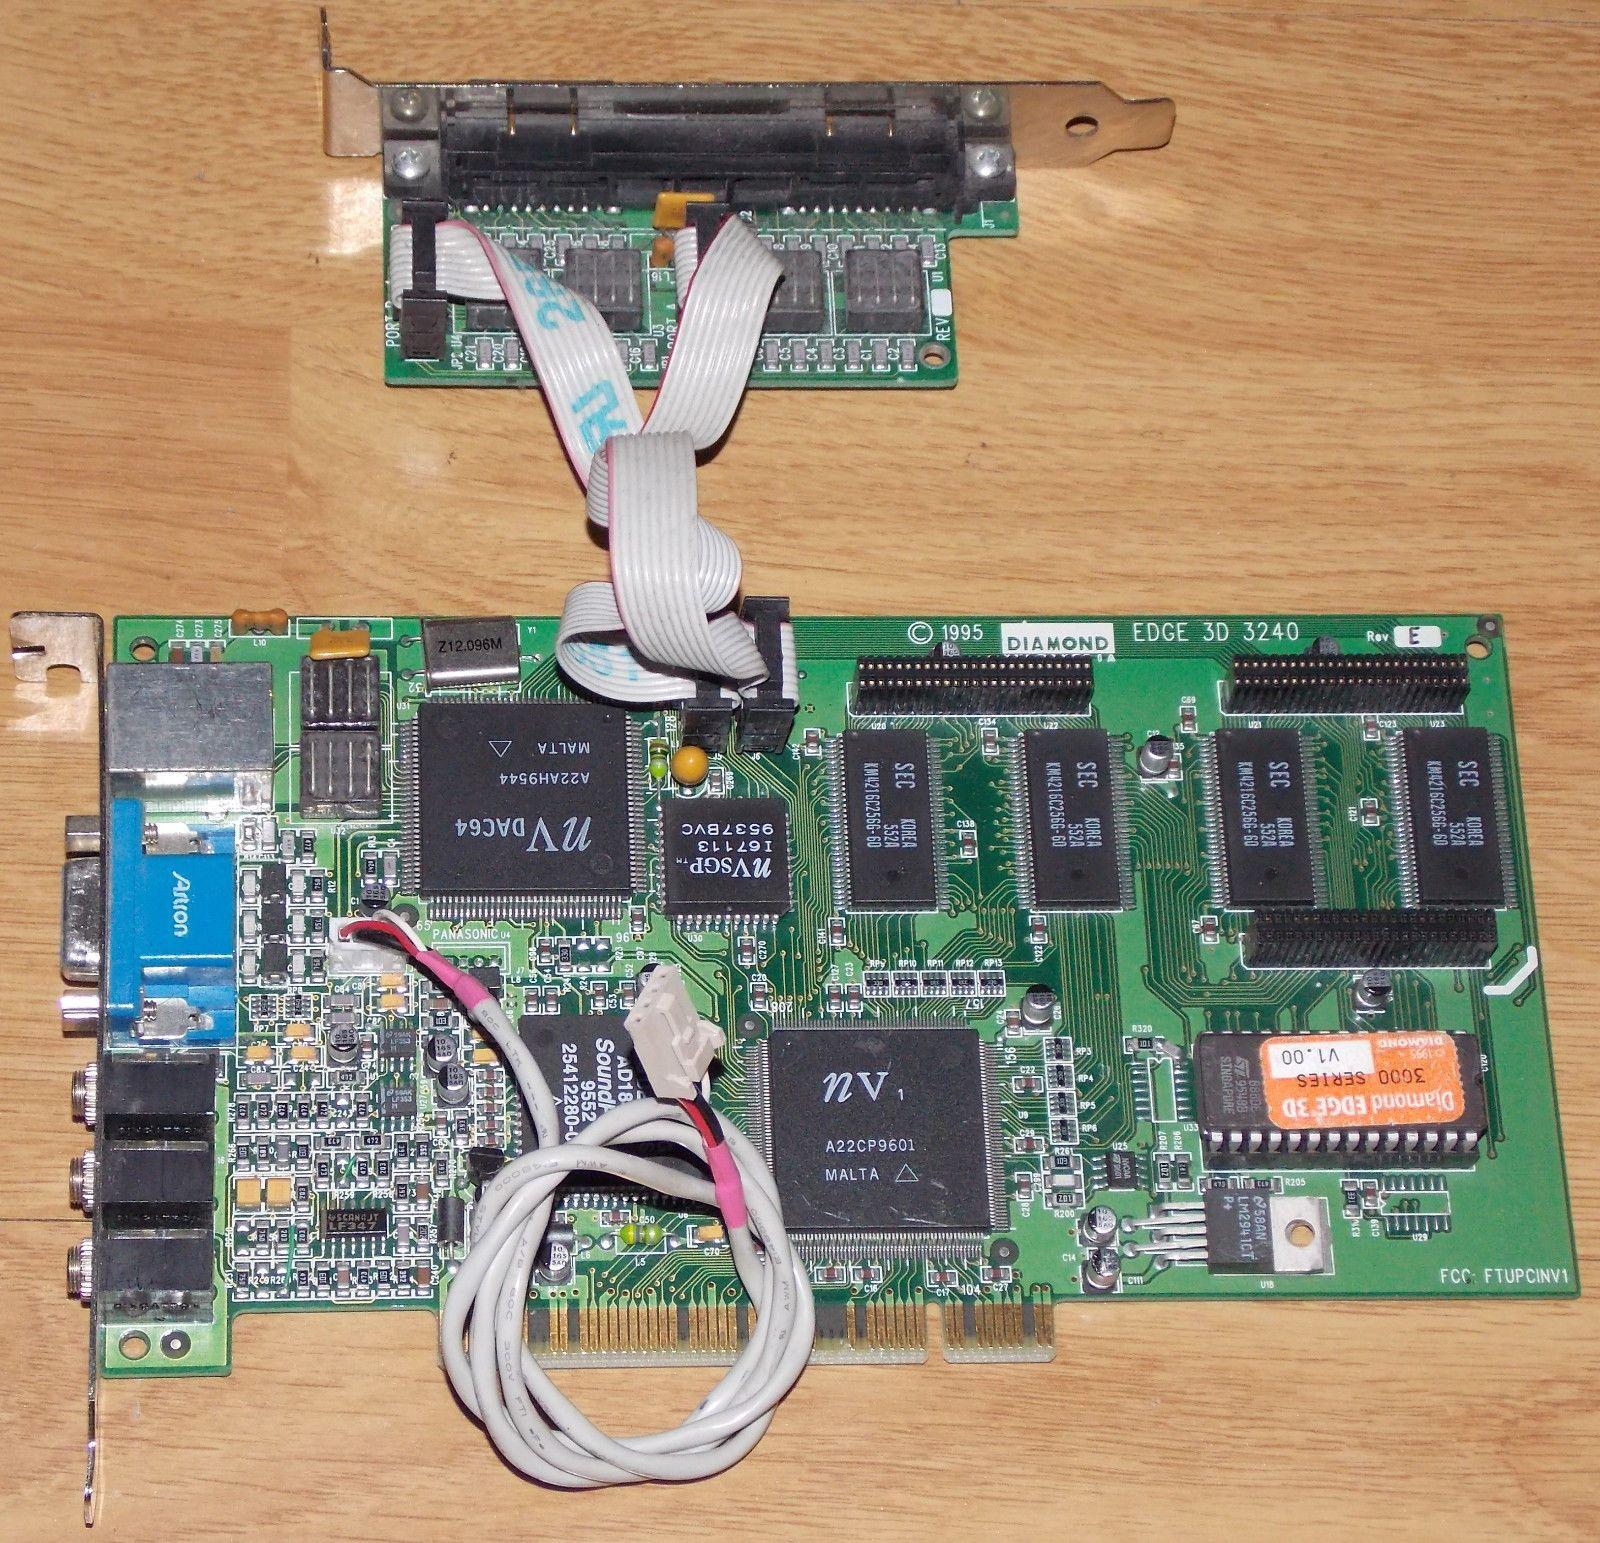 diamond edge 3d 3240 video card multimedia 3000 series 1995 nv1 diamond edge 3d 3240 video card multimedia 3000 series 1995 nv1 sega pc